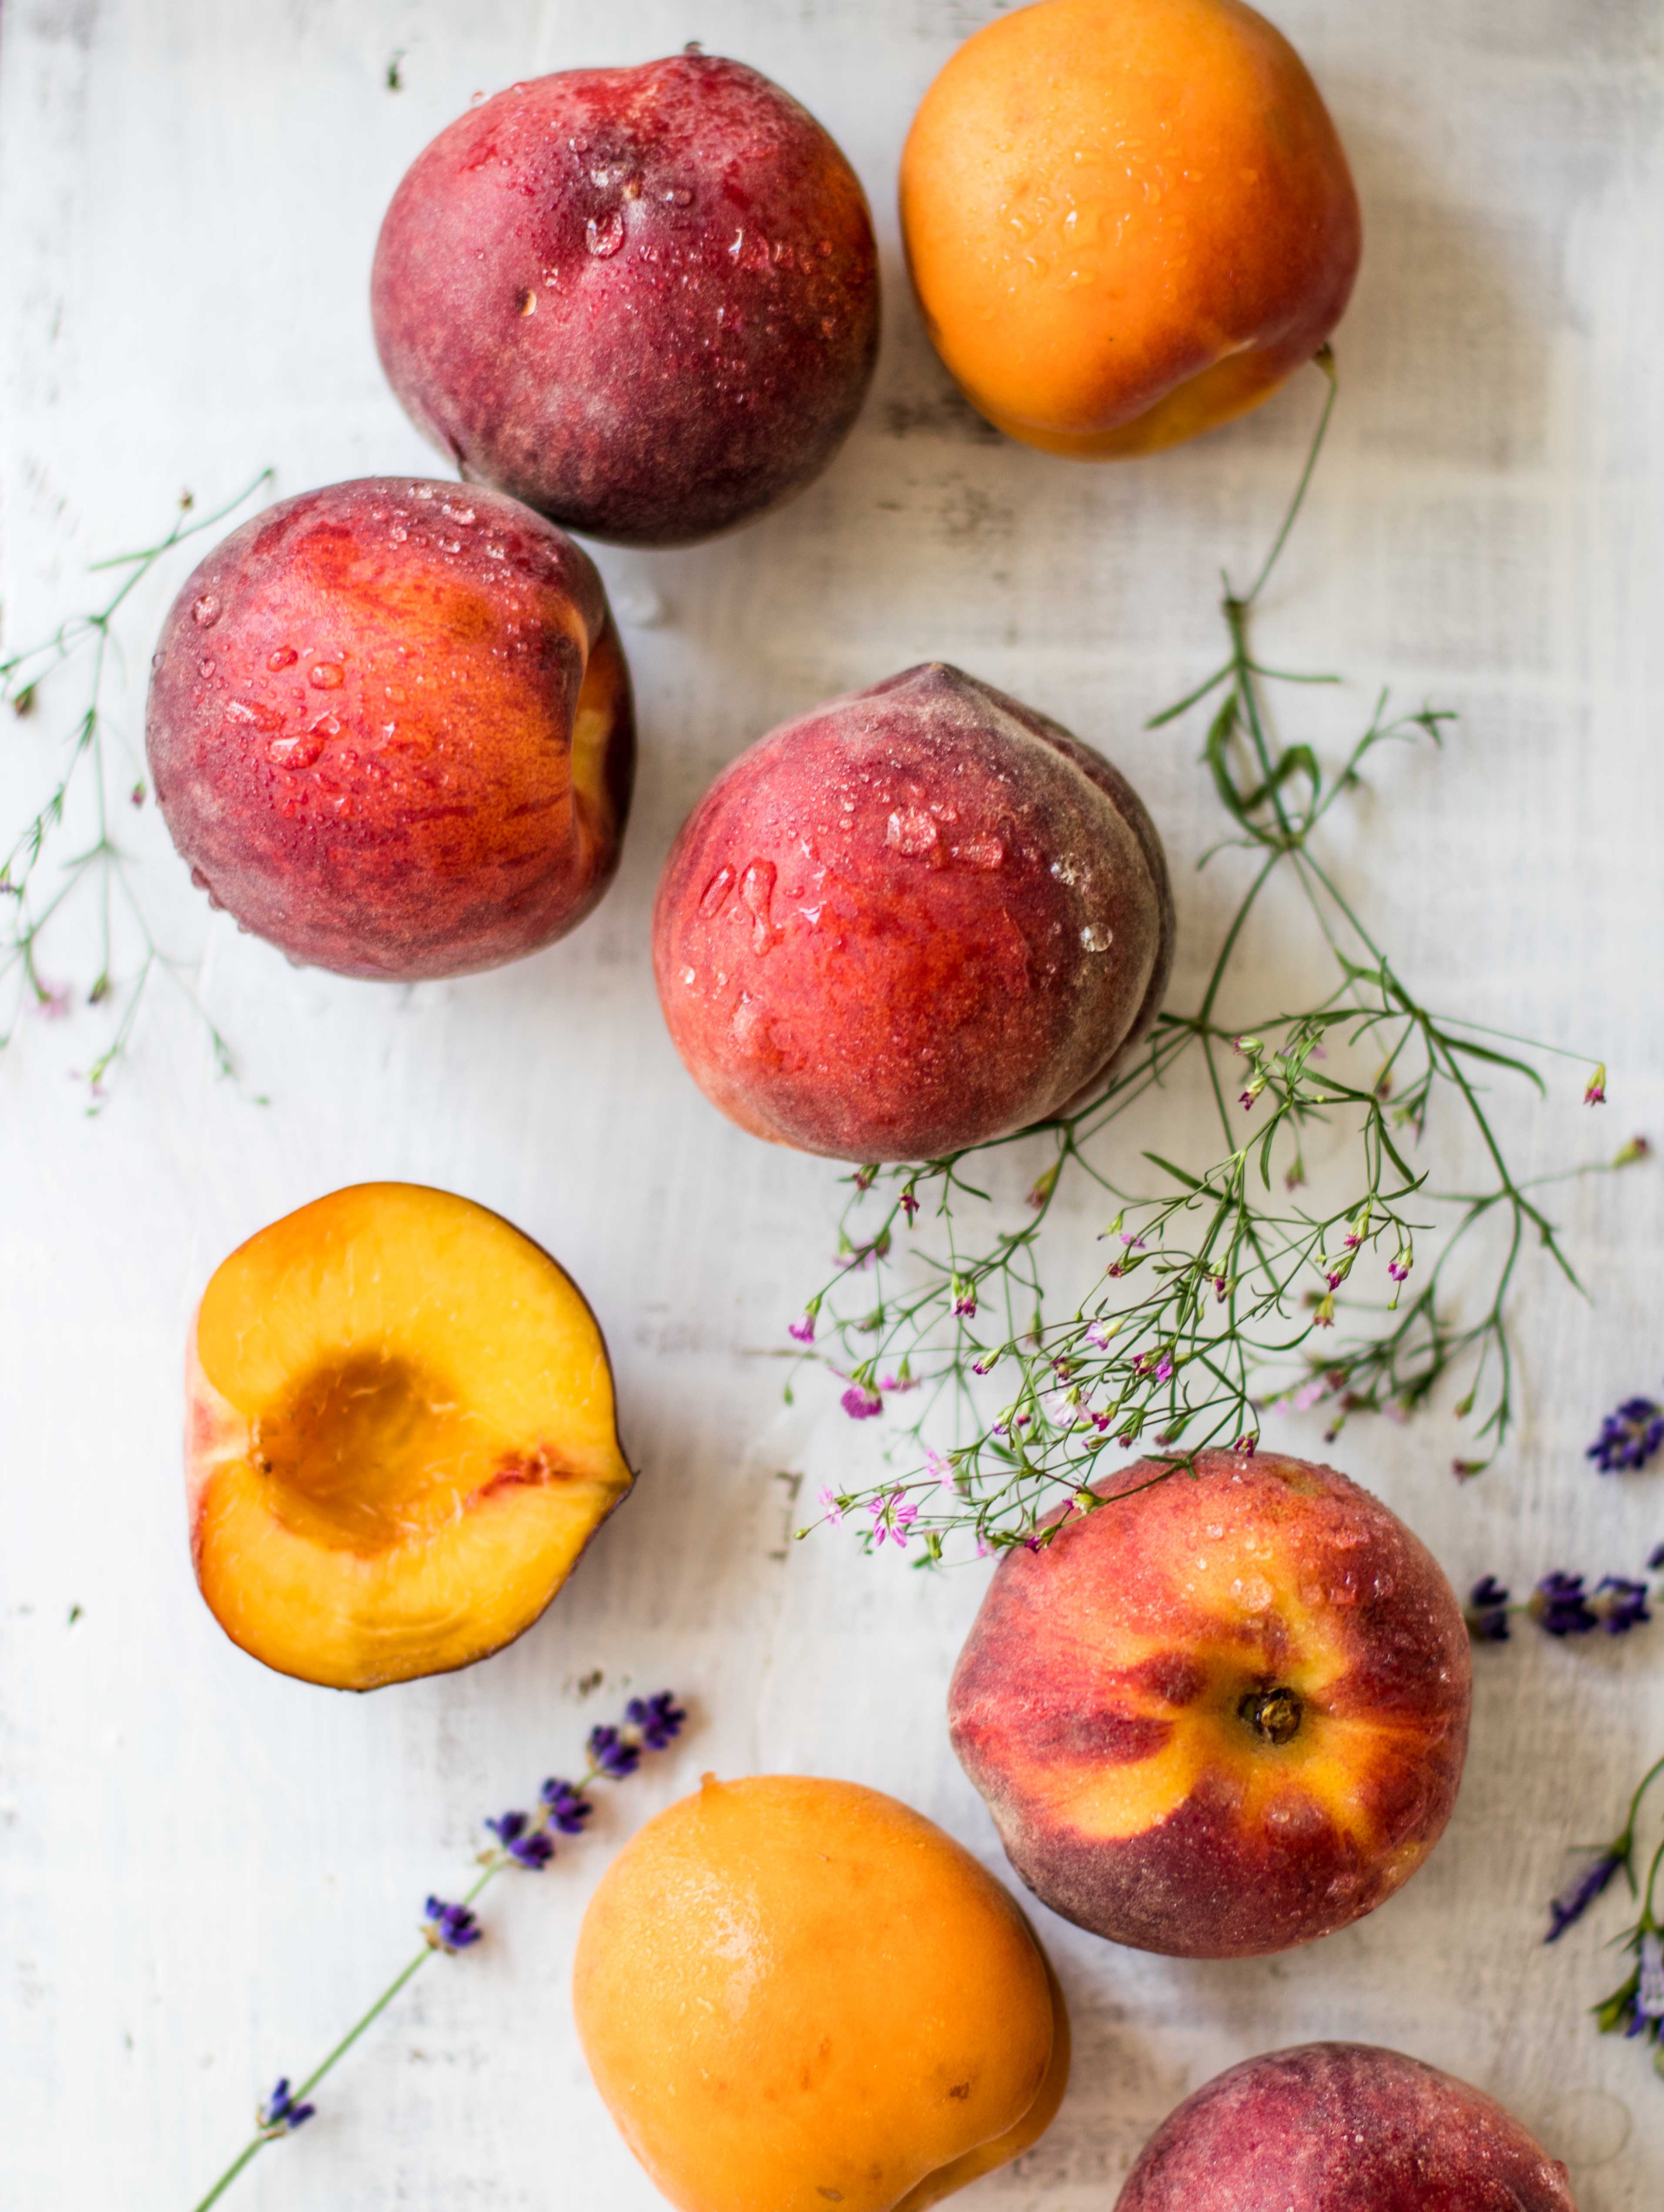 Peach apricot ice cream